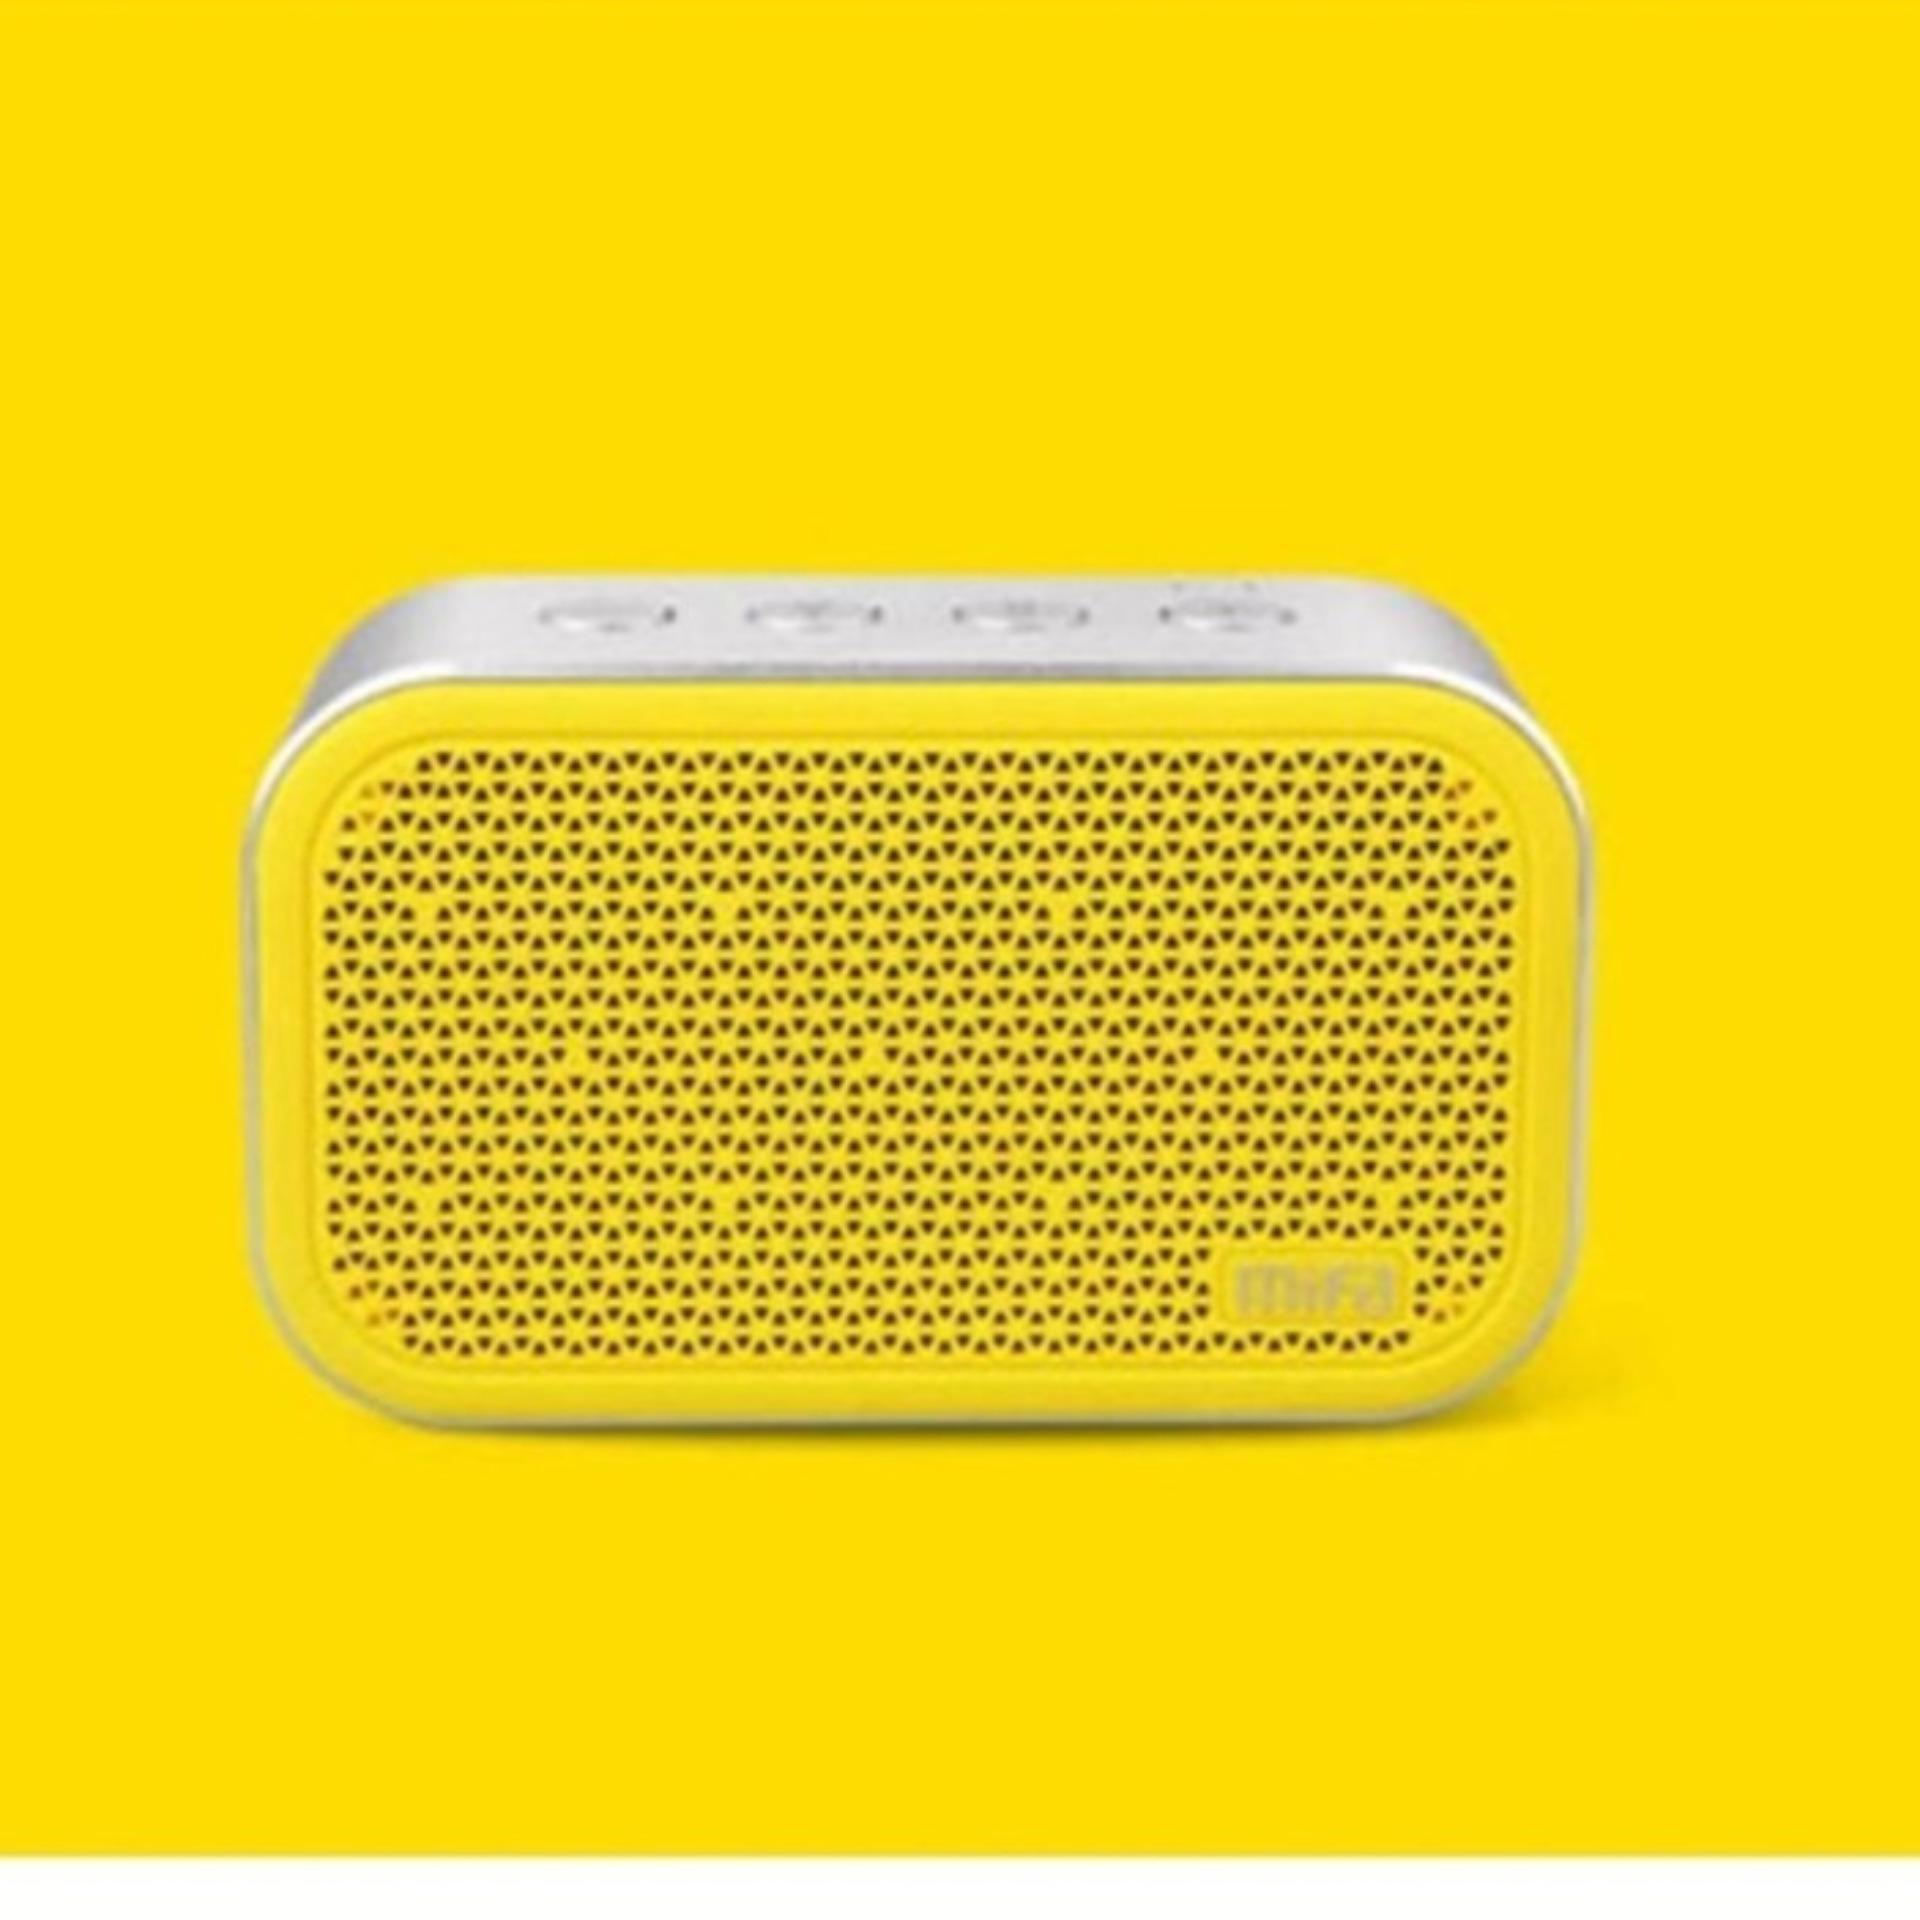 Flash Sale Xiaomi Mifa M1 Bluetooh Portable Speaker Cube With Bluetooth Microsd Slot New Version Kuning